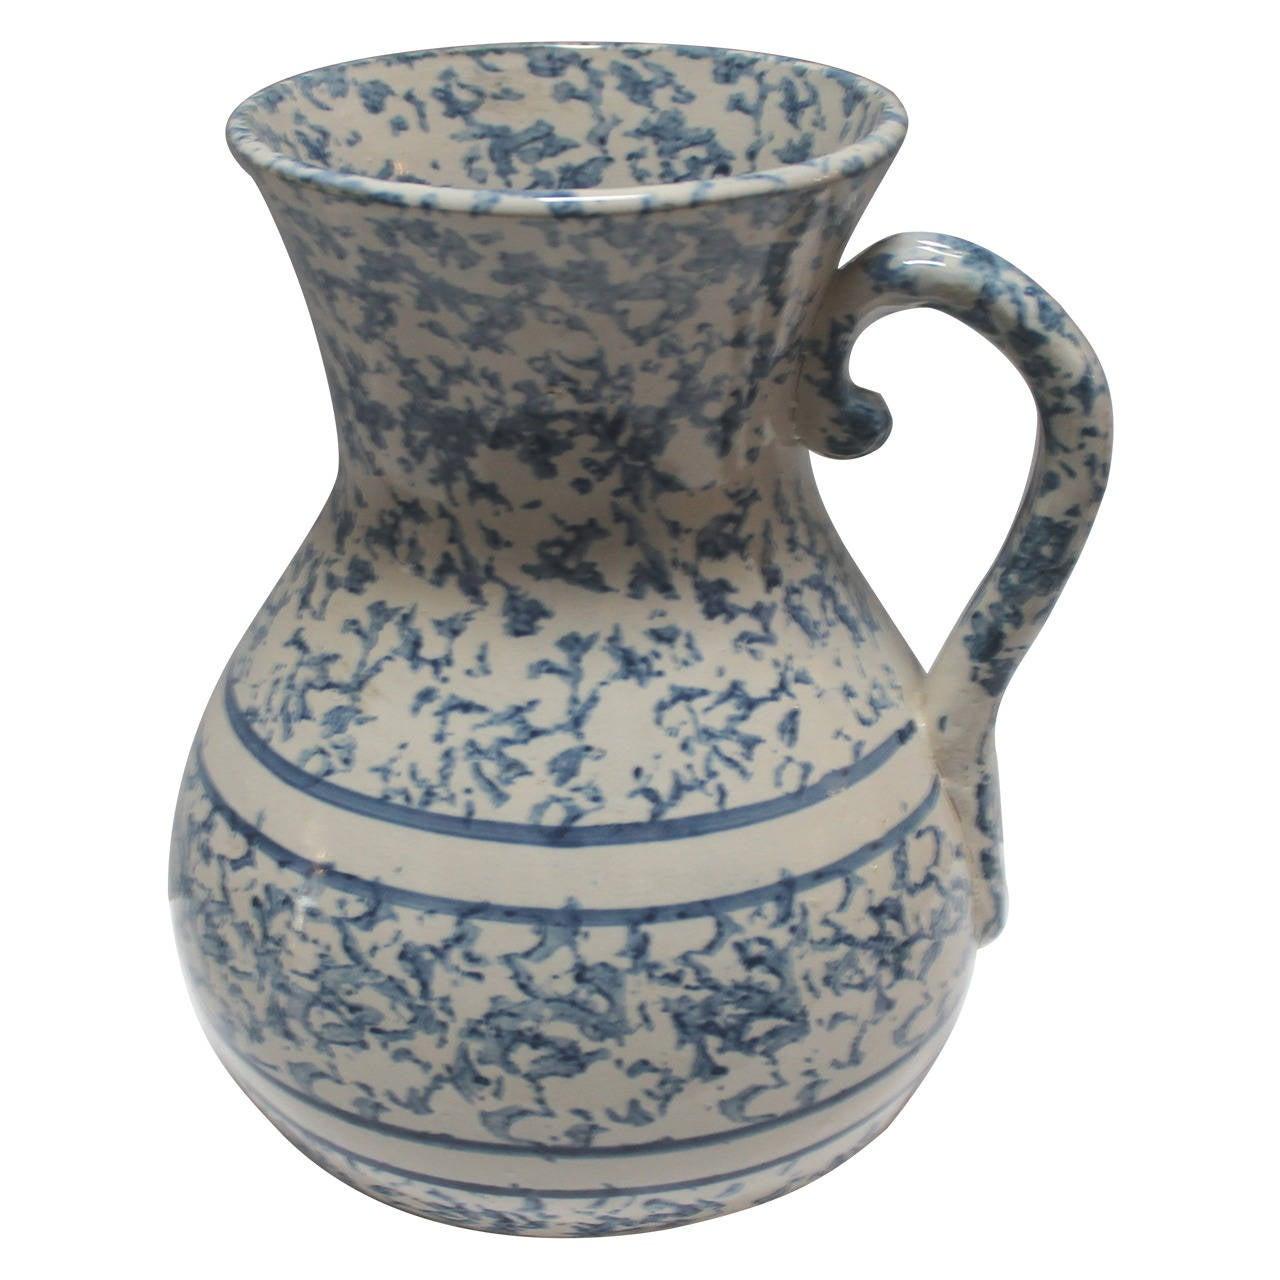 19th Century Monumental Sponge Ware Pottery Pitcher